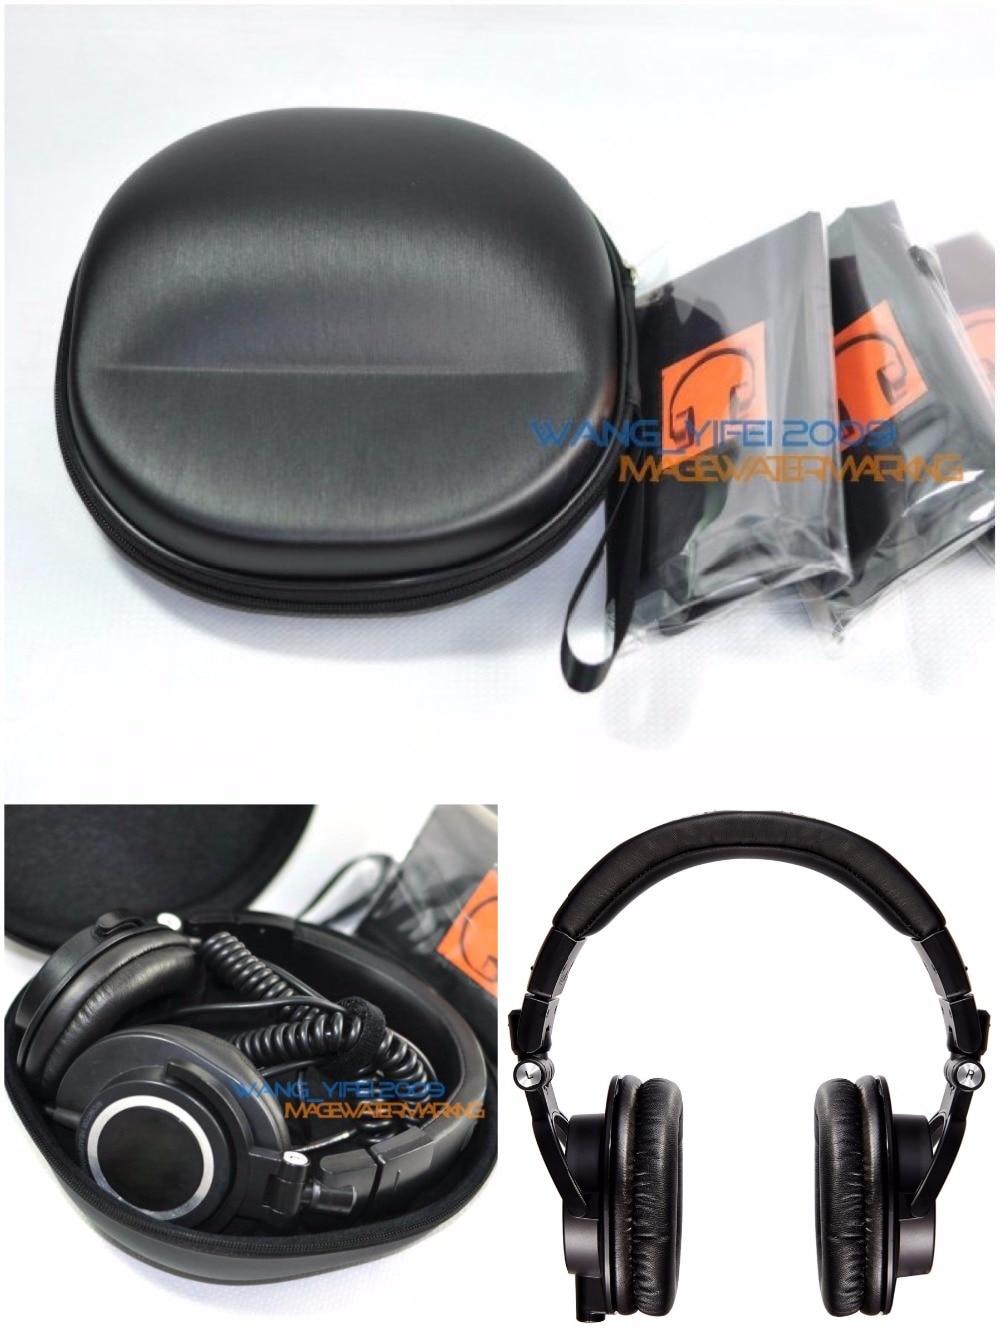 تكنيكا-صندوق حقيبة حمل صلب لسماعات الرأس M30 و M40x و M50 و M50s و M50x